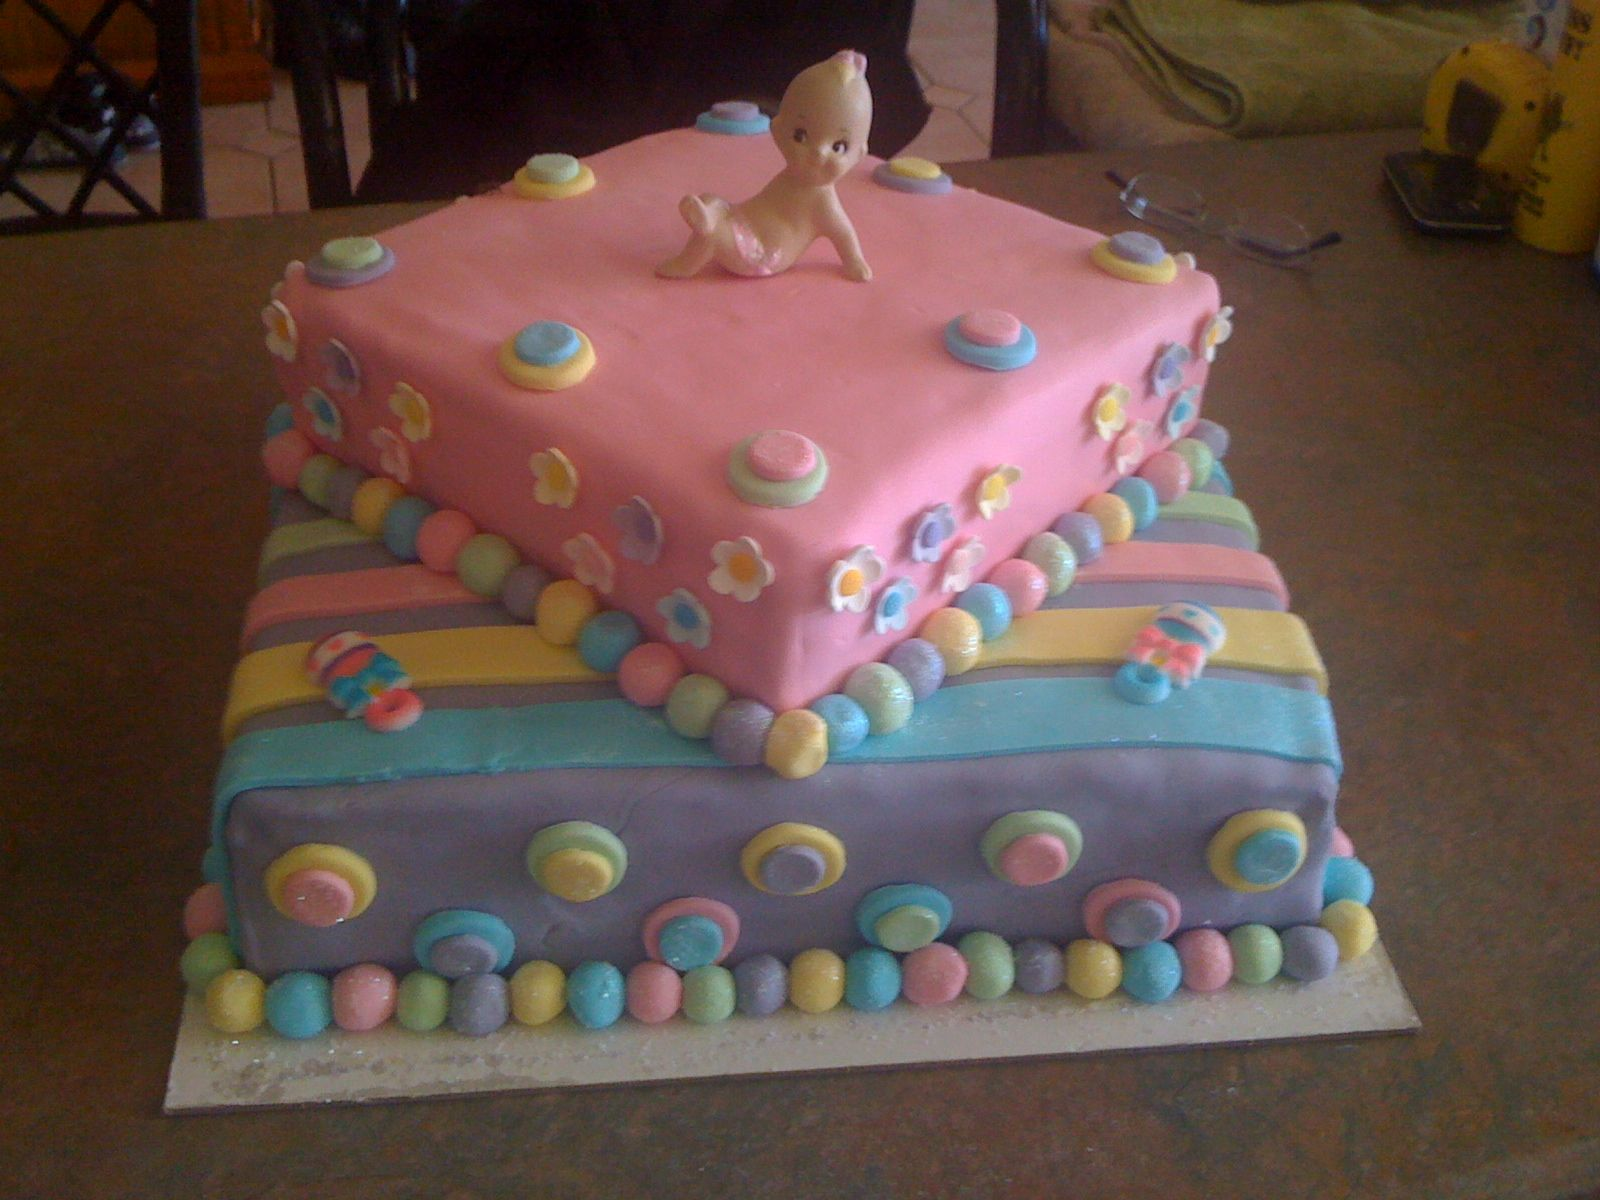 Rainbow baby shower cake Amazing cakes & desserts